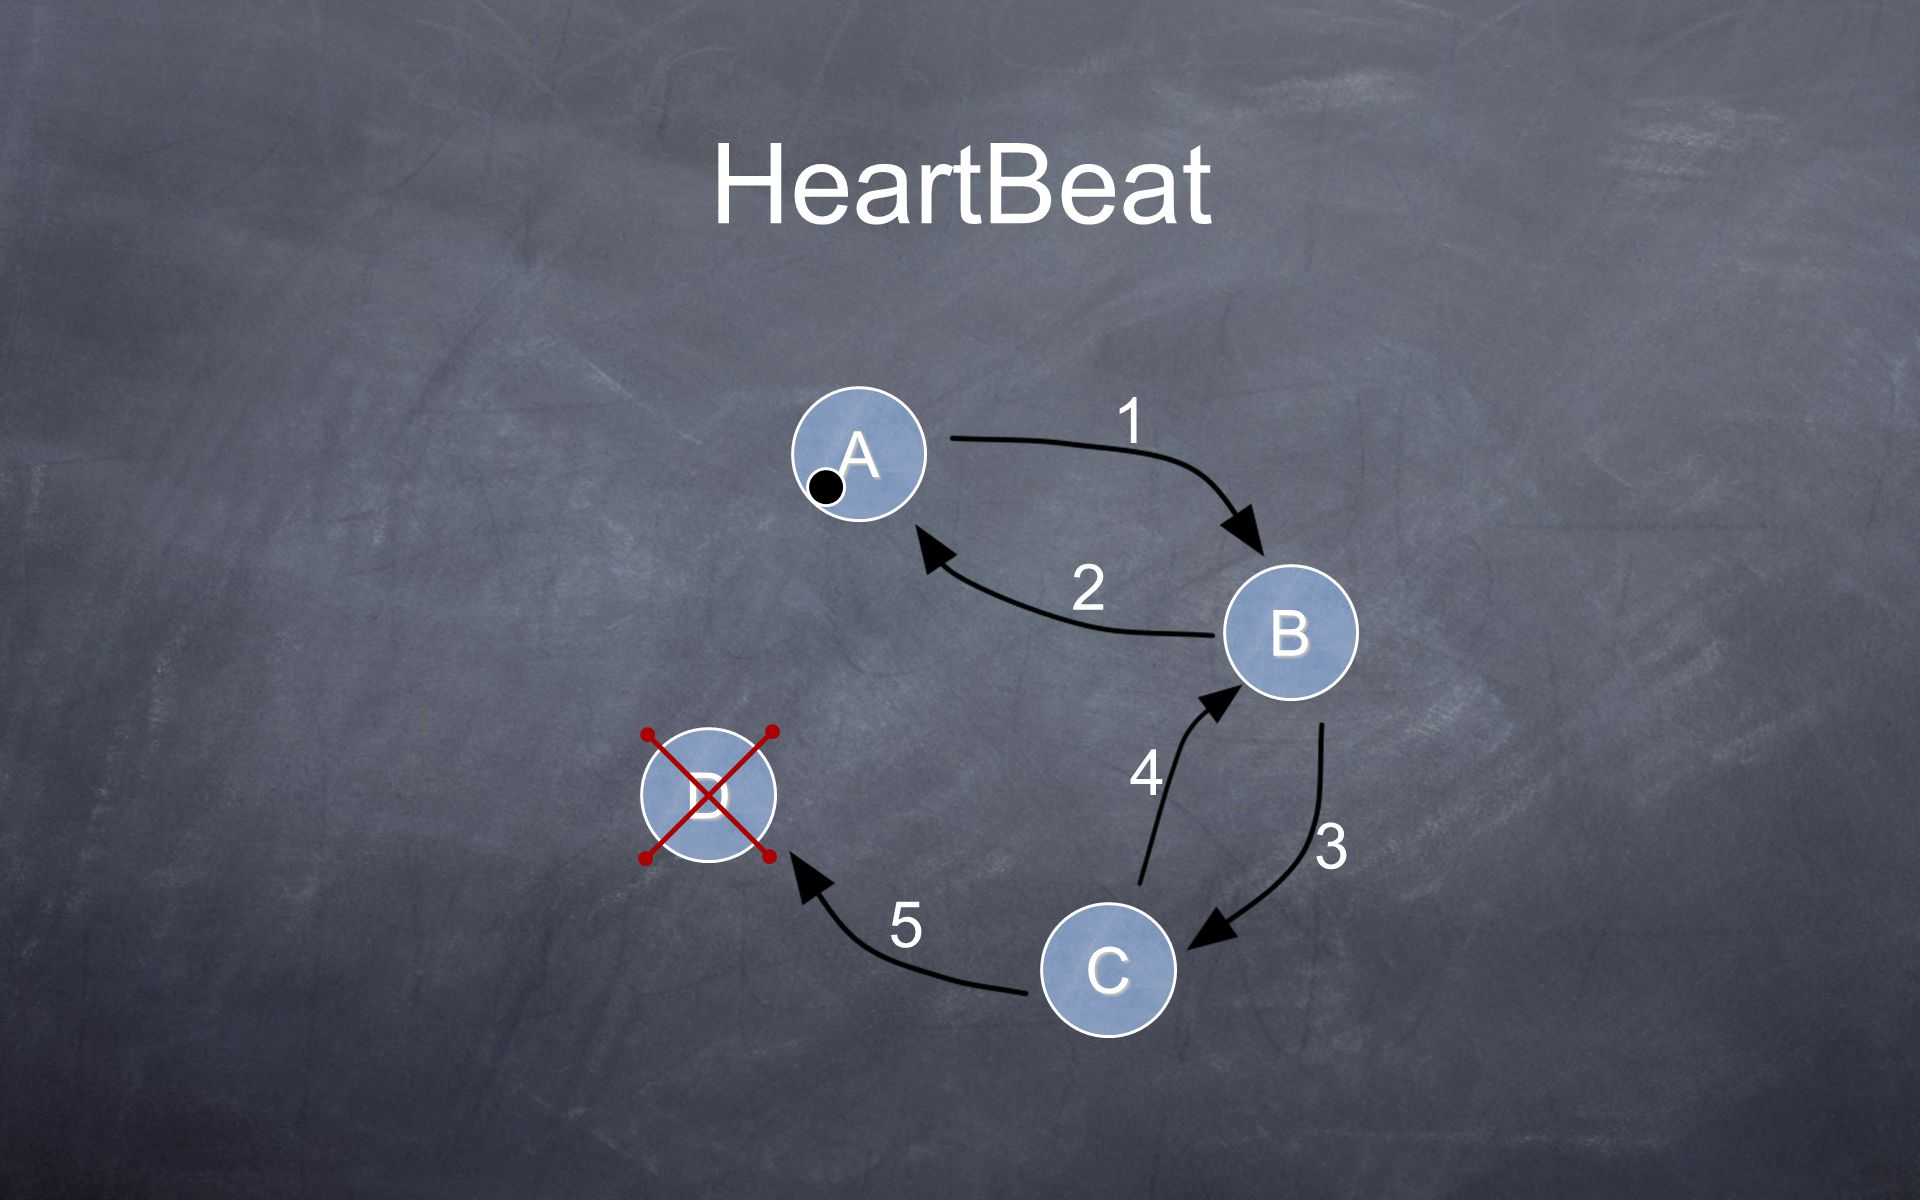 HeartBeat A B C D 1 2 3 4 5